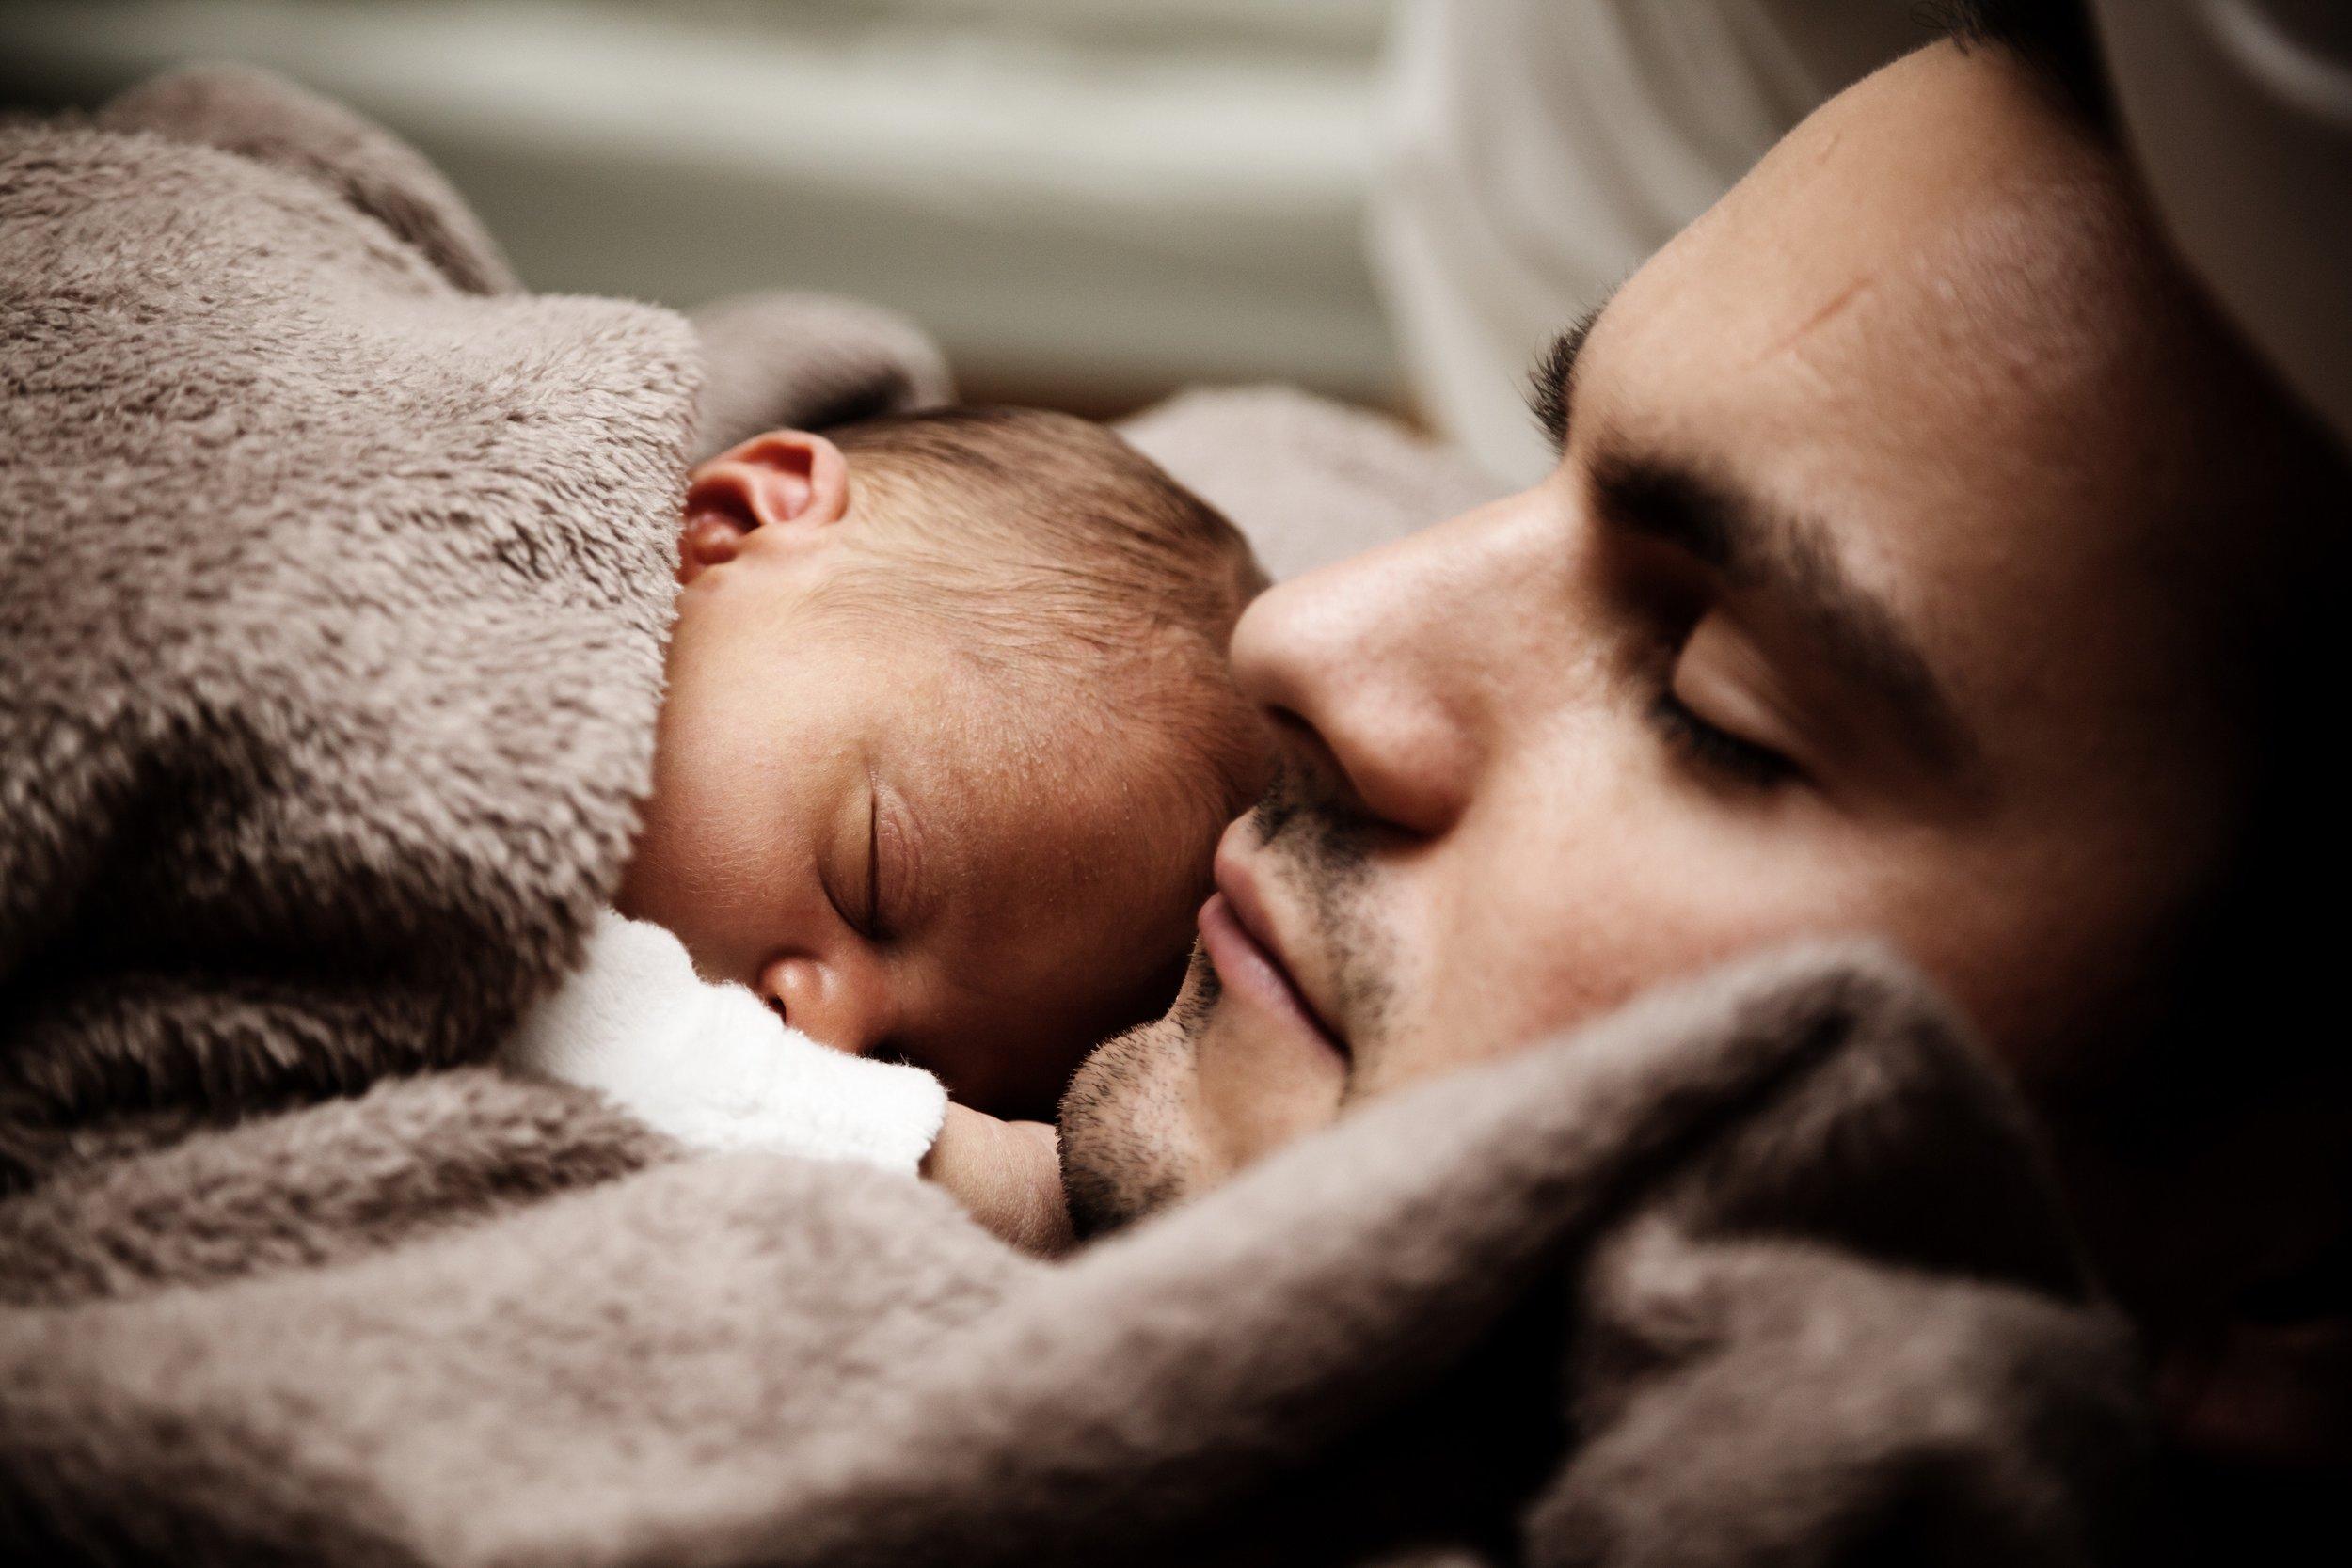 adorable-baby-born-2133 (1).jpg